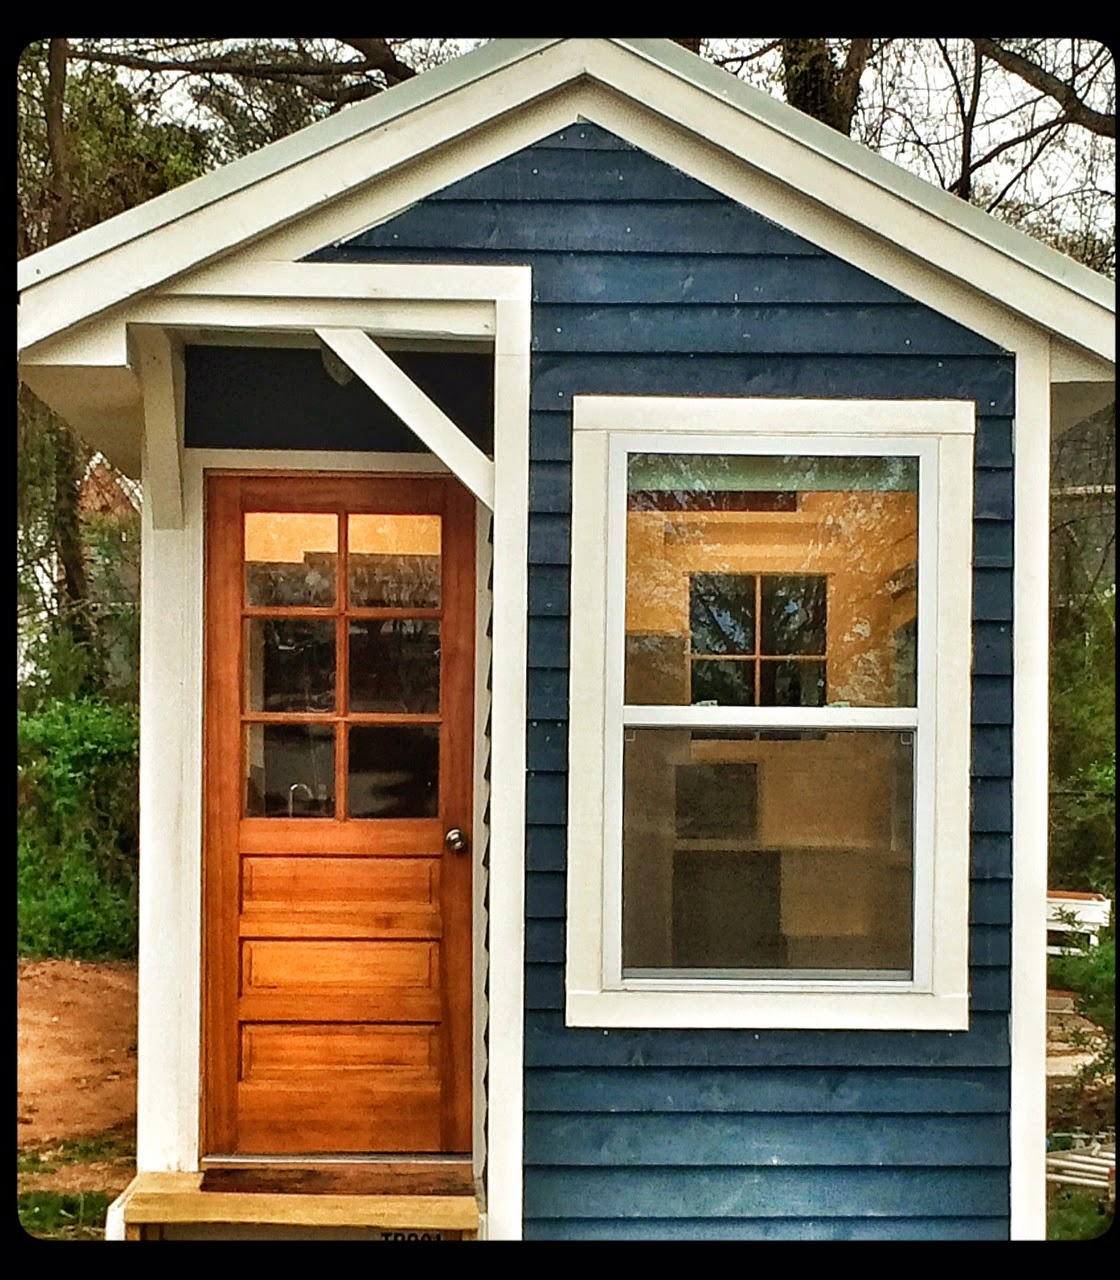 La Petite Maison Atlanta la petite maison: tiny house conference wrap-up